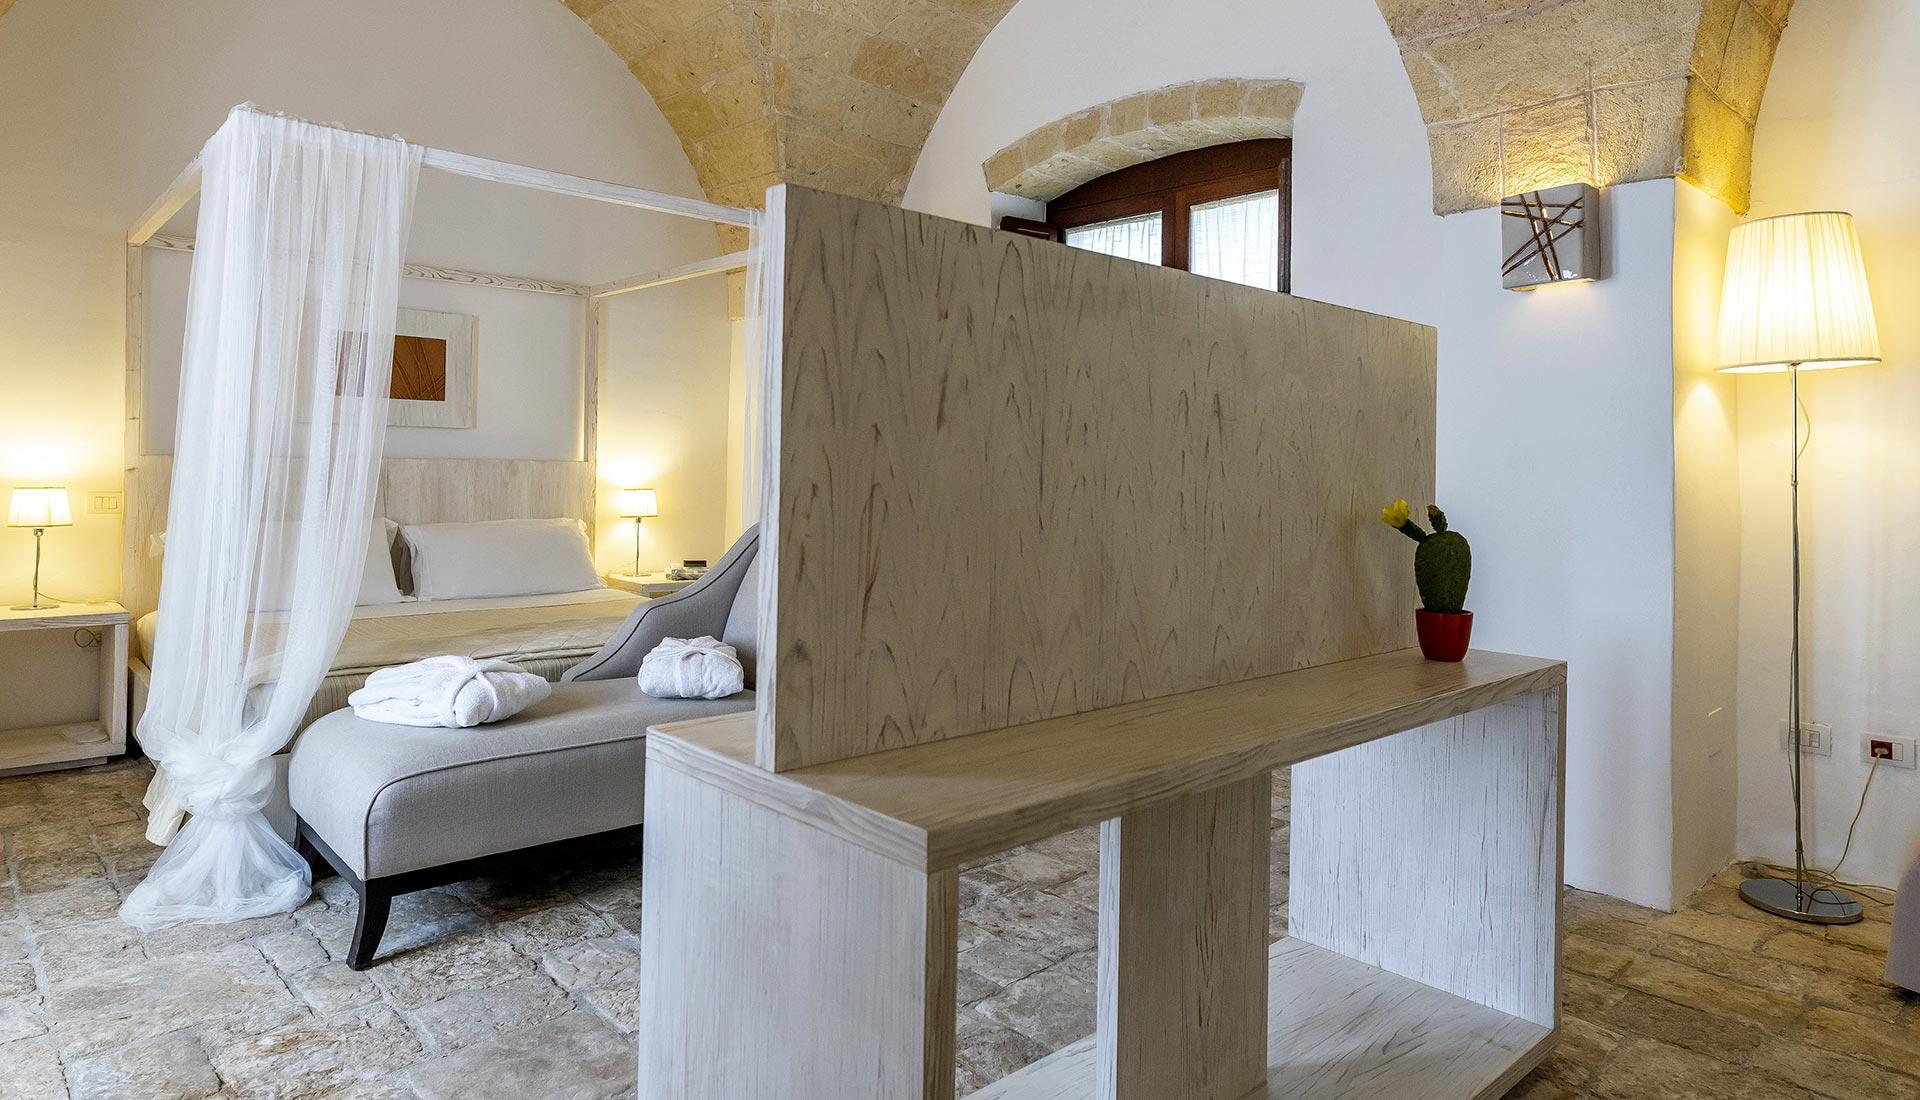 1_5_suite-conte-masseria-salento-07.jpg